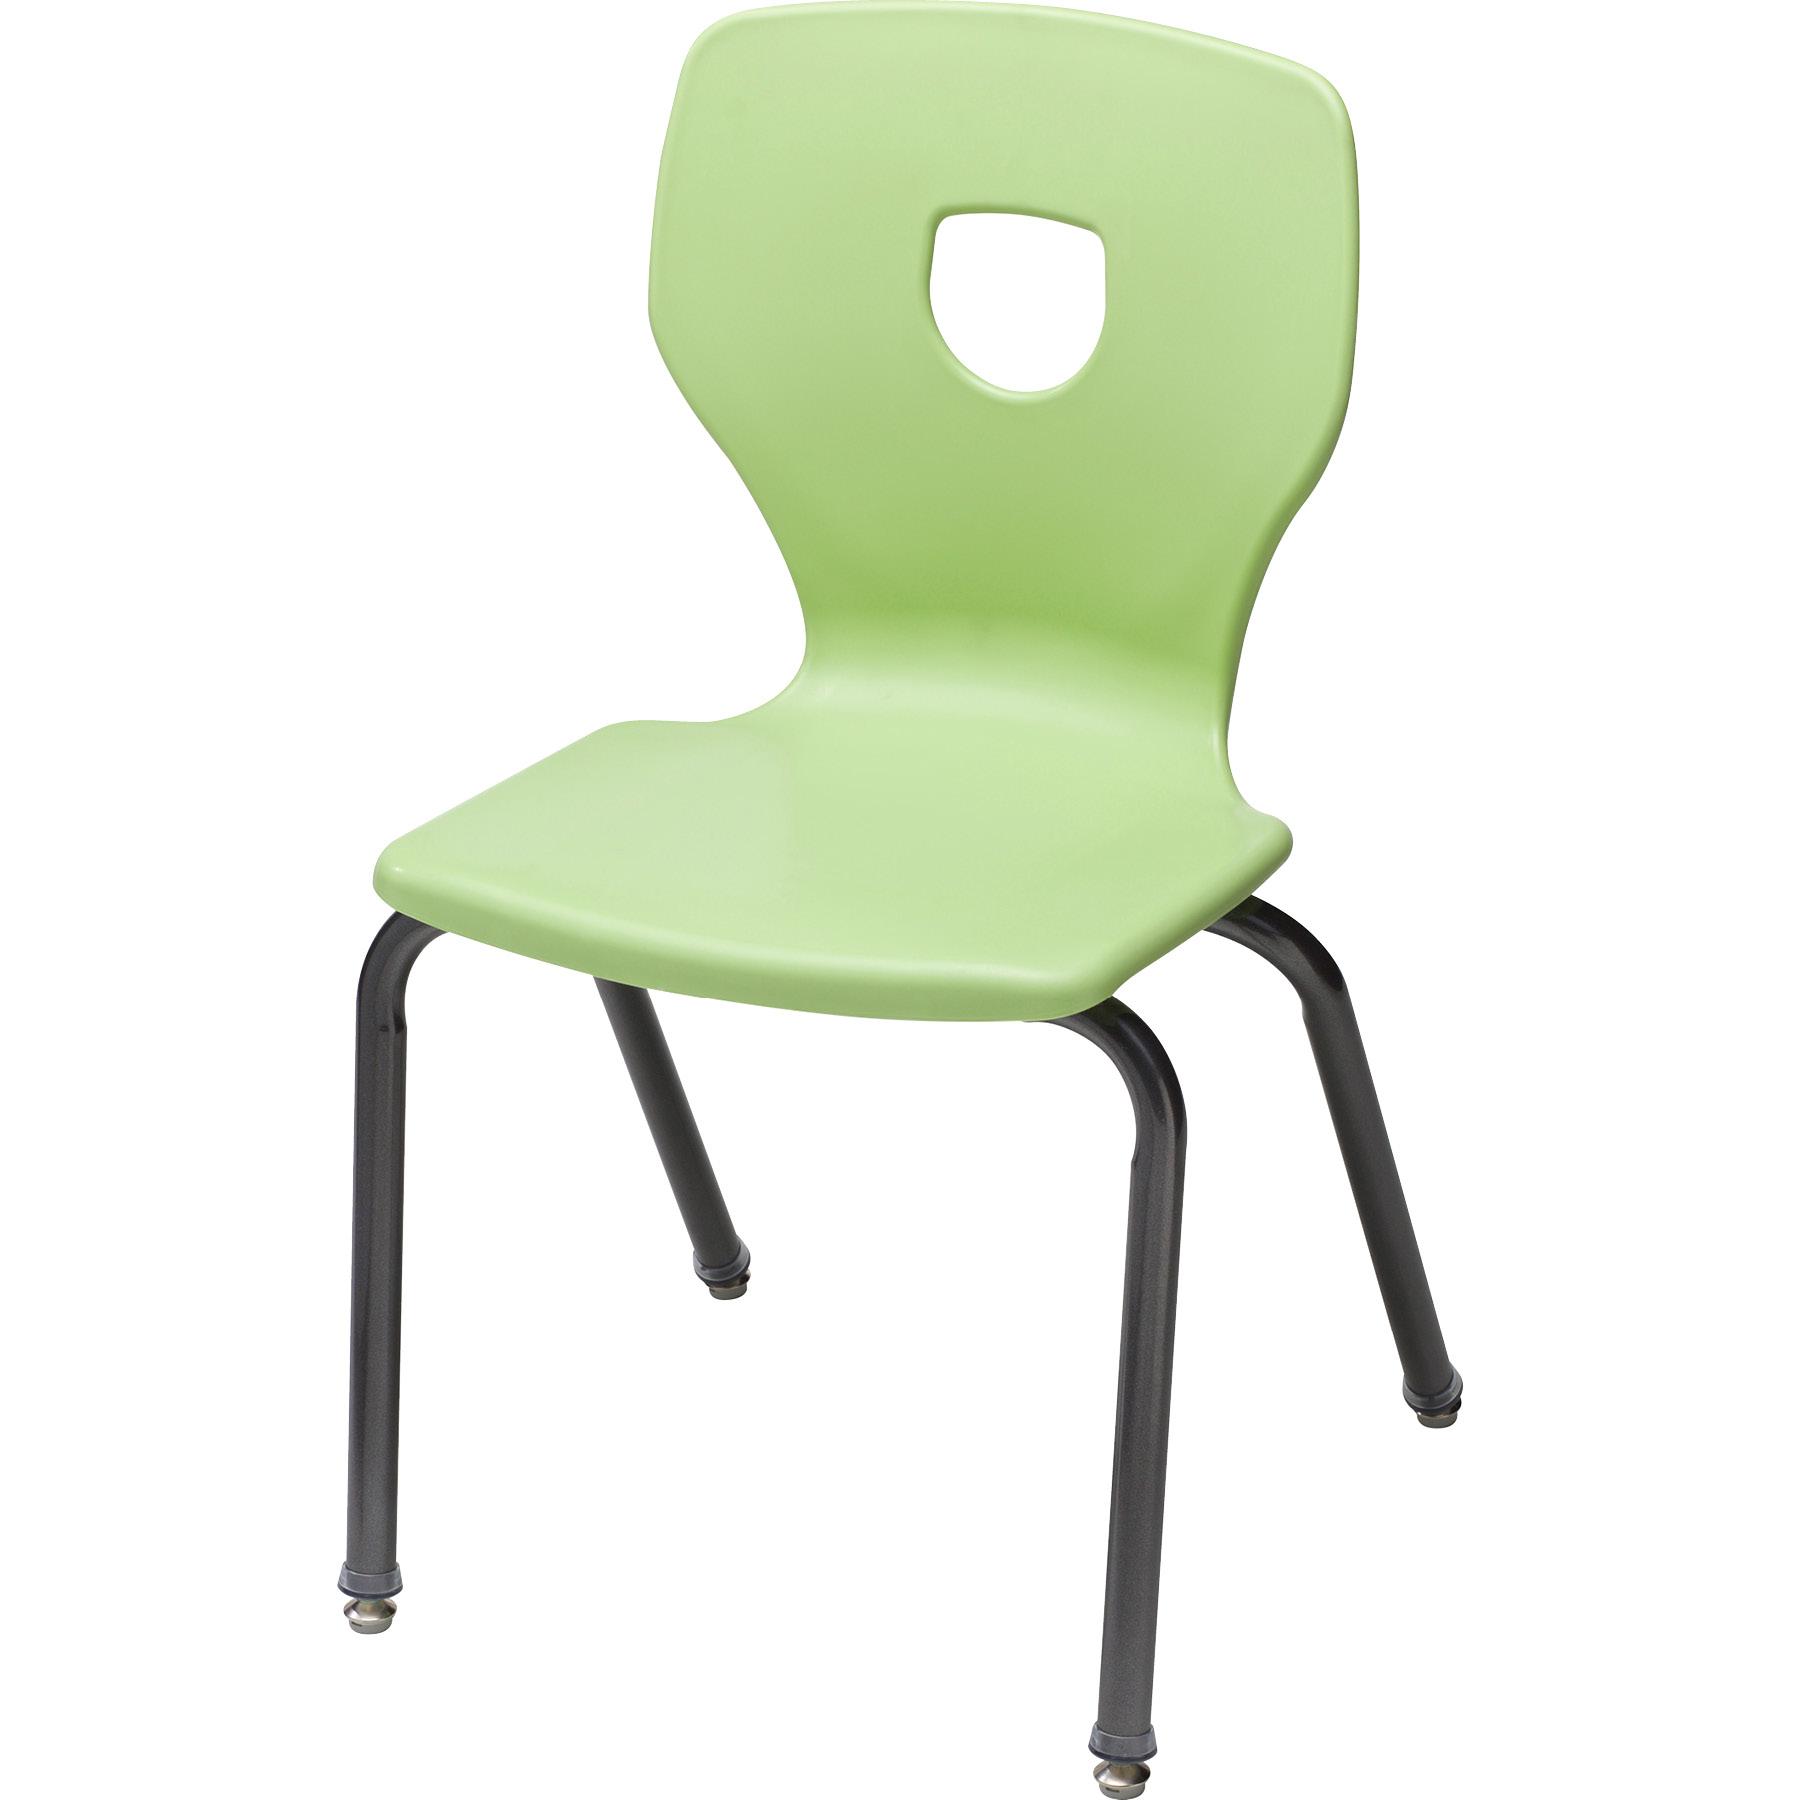 1558 Silhoflex Stacking Chair